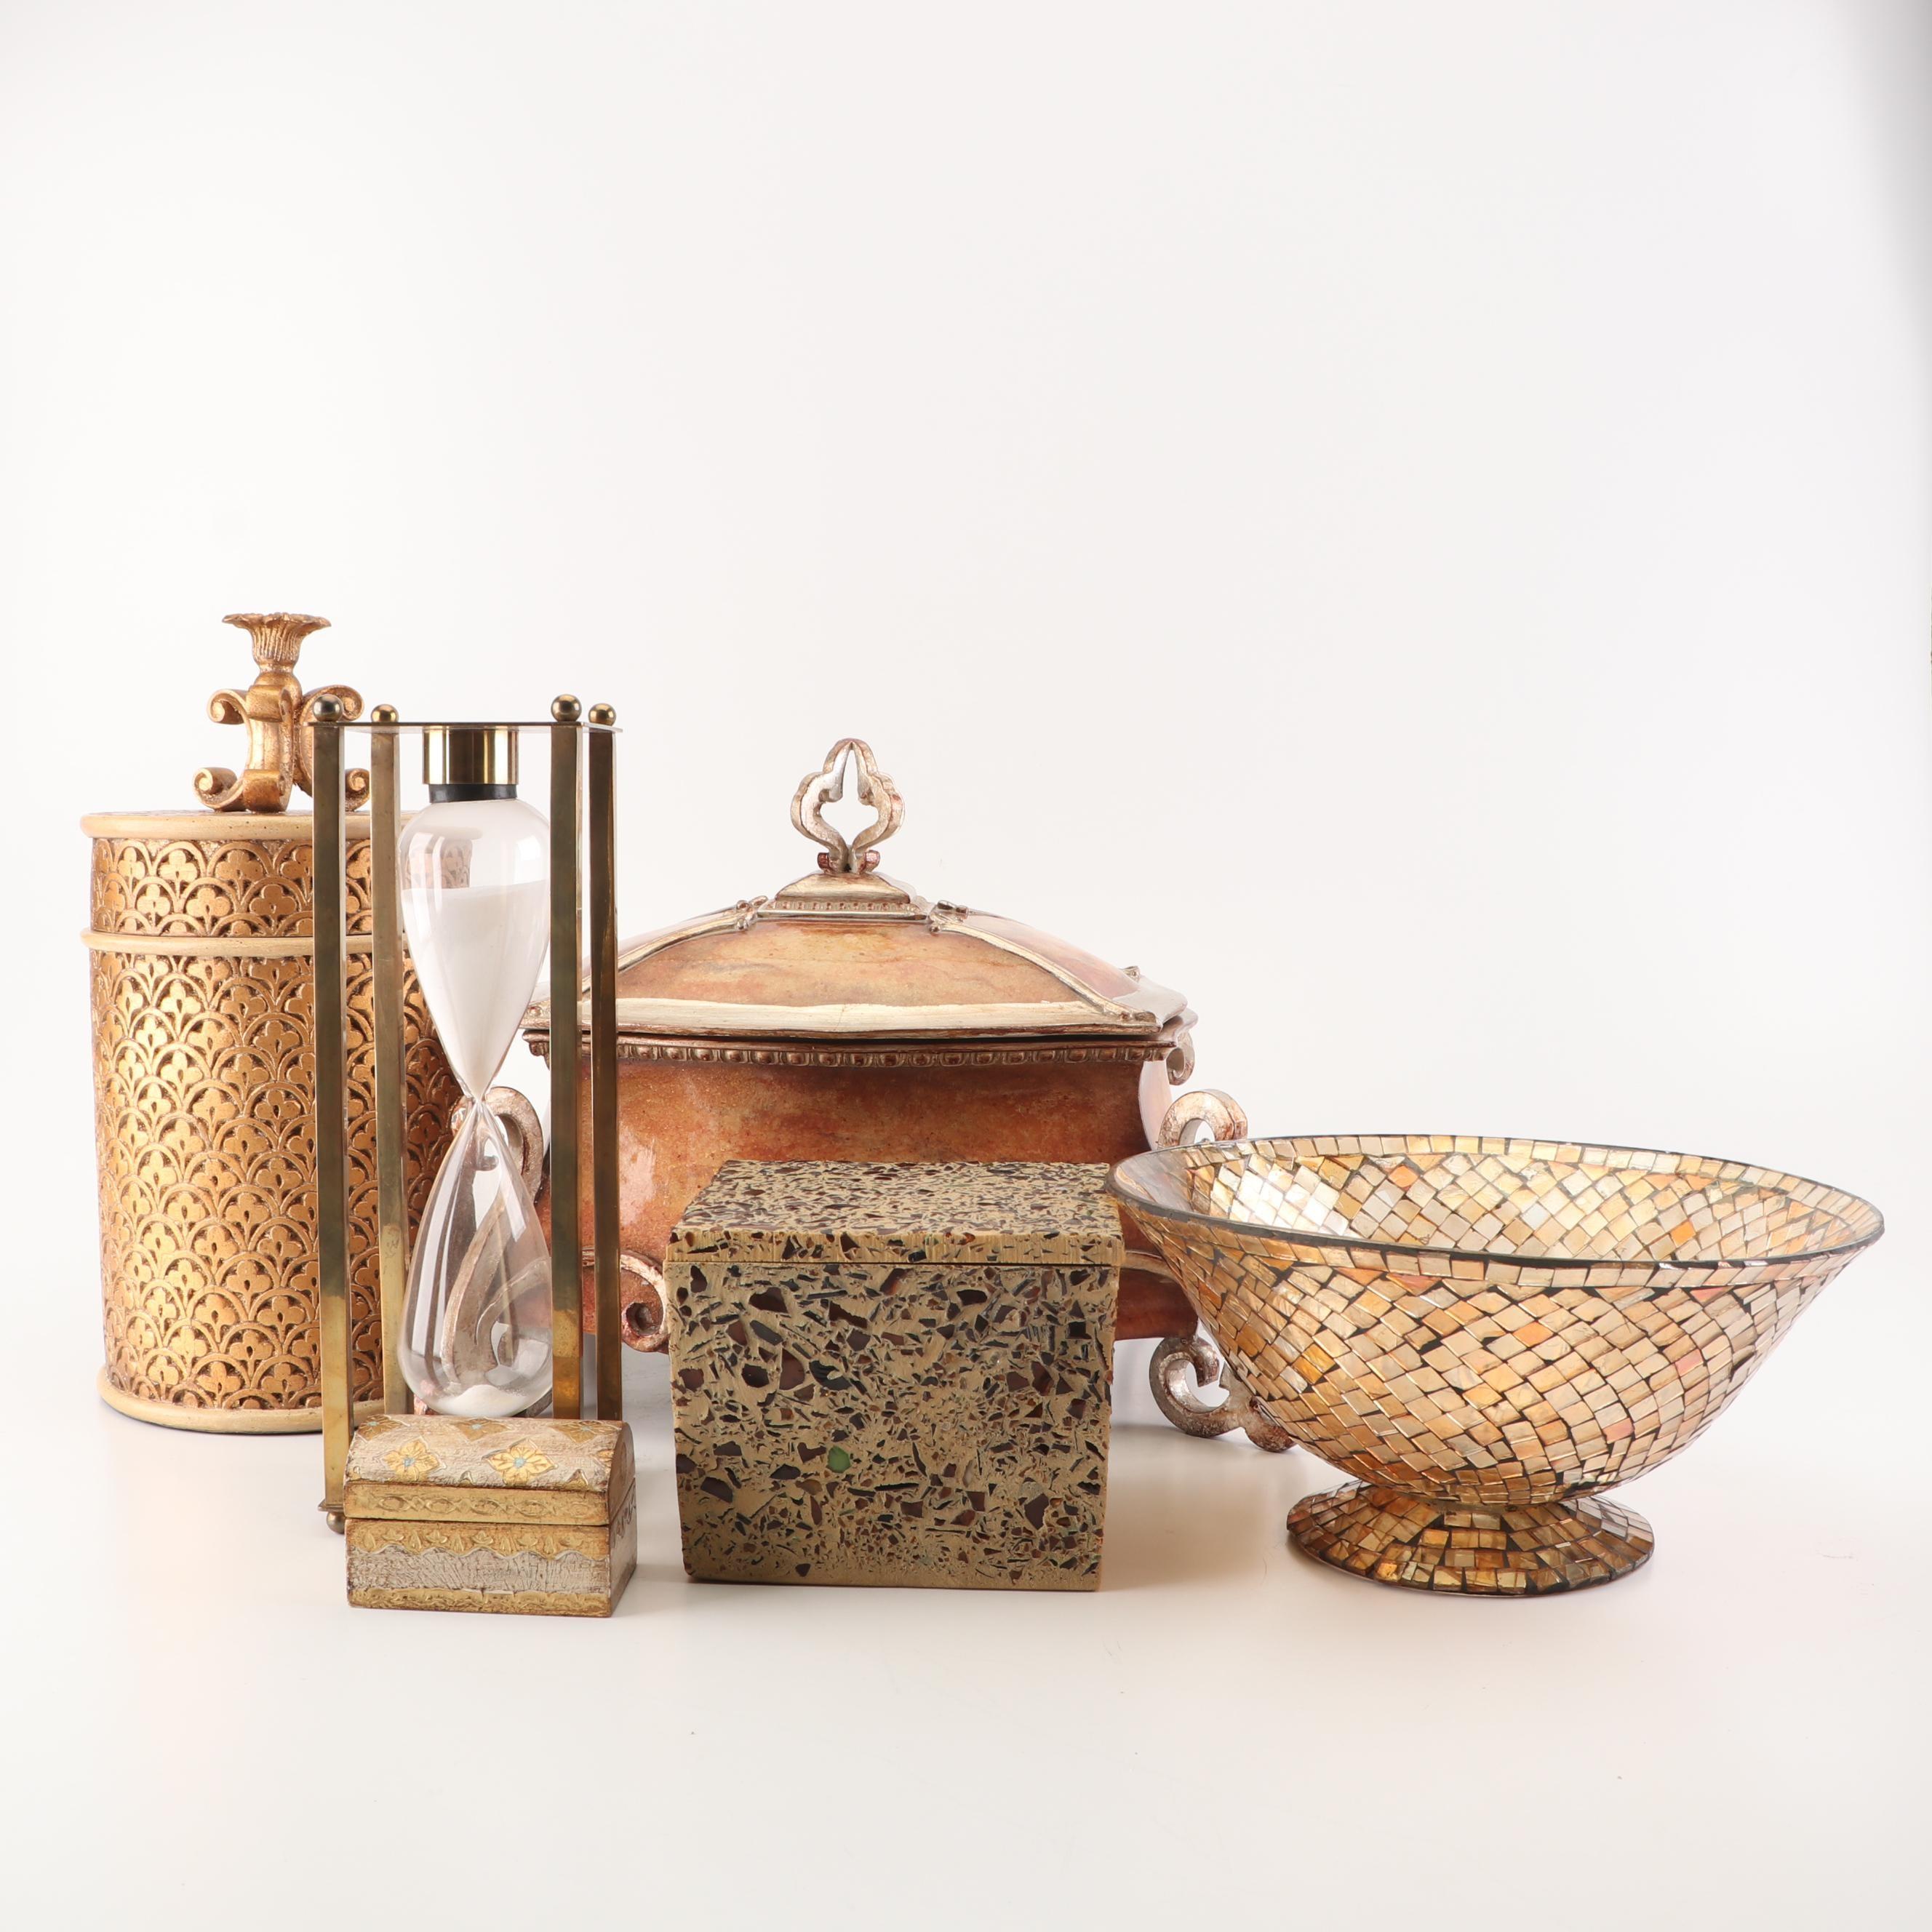 Decorative Metallic Boxes, Glass Mosaic Bowl, and Brass Hourglass